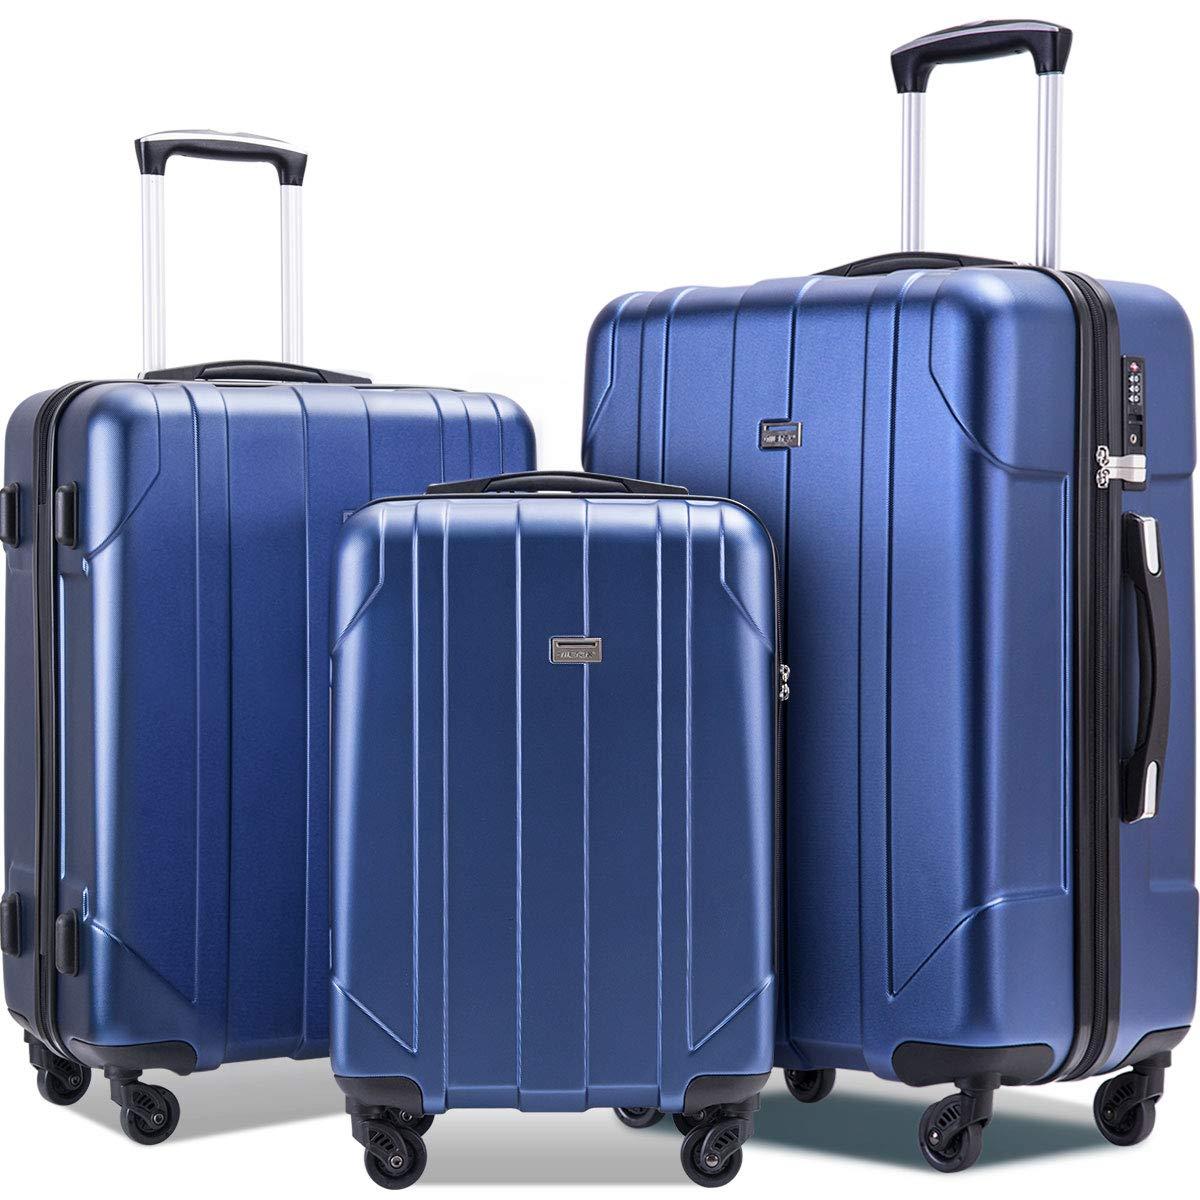 Merax Luggage Sets with TSA Locks, 3 Piece Lightweight P.E.T Luggage 20inch 24inch 28inch by Merax